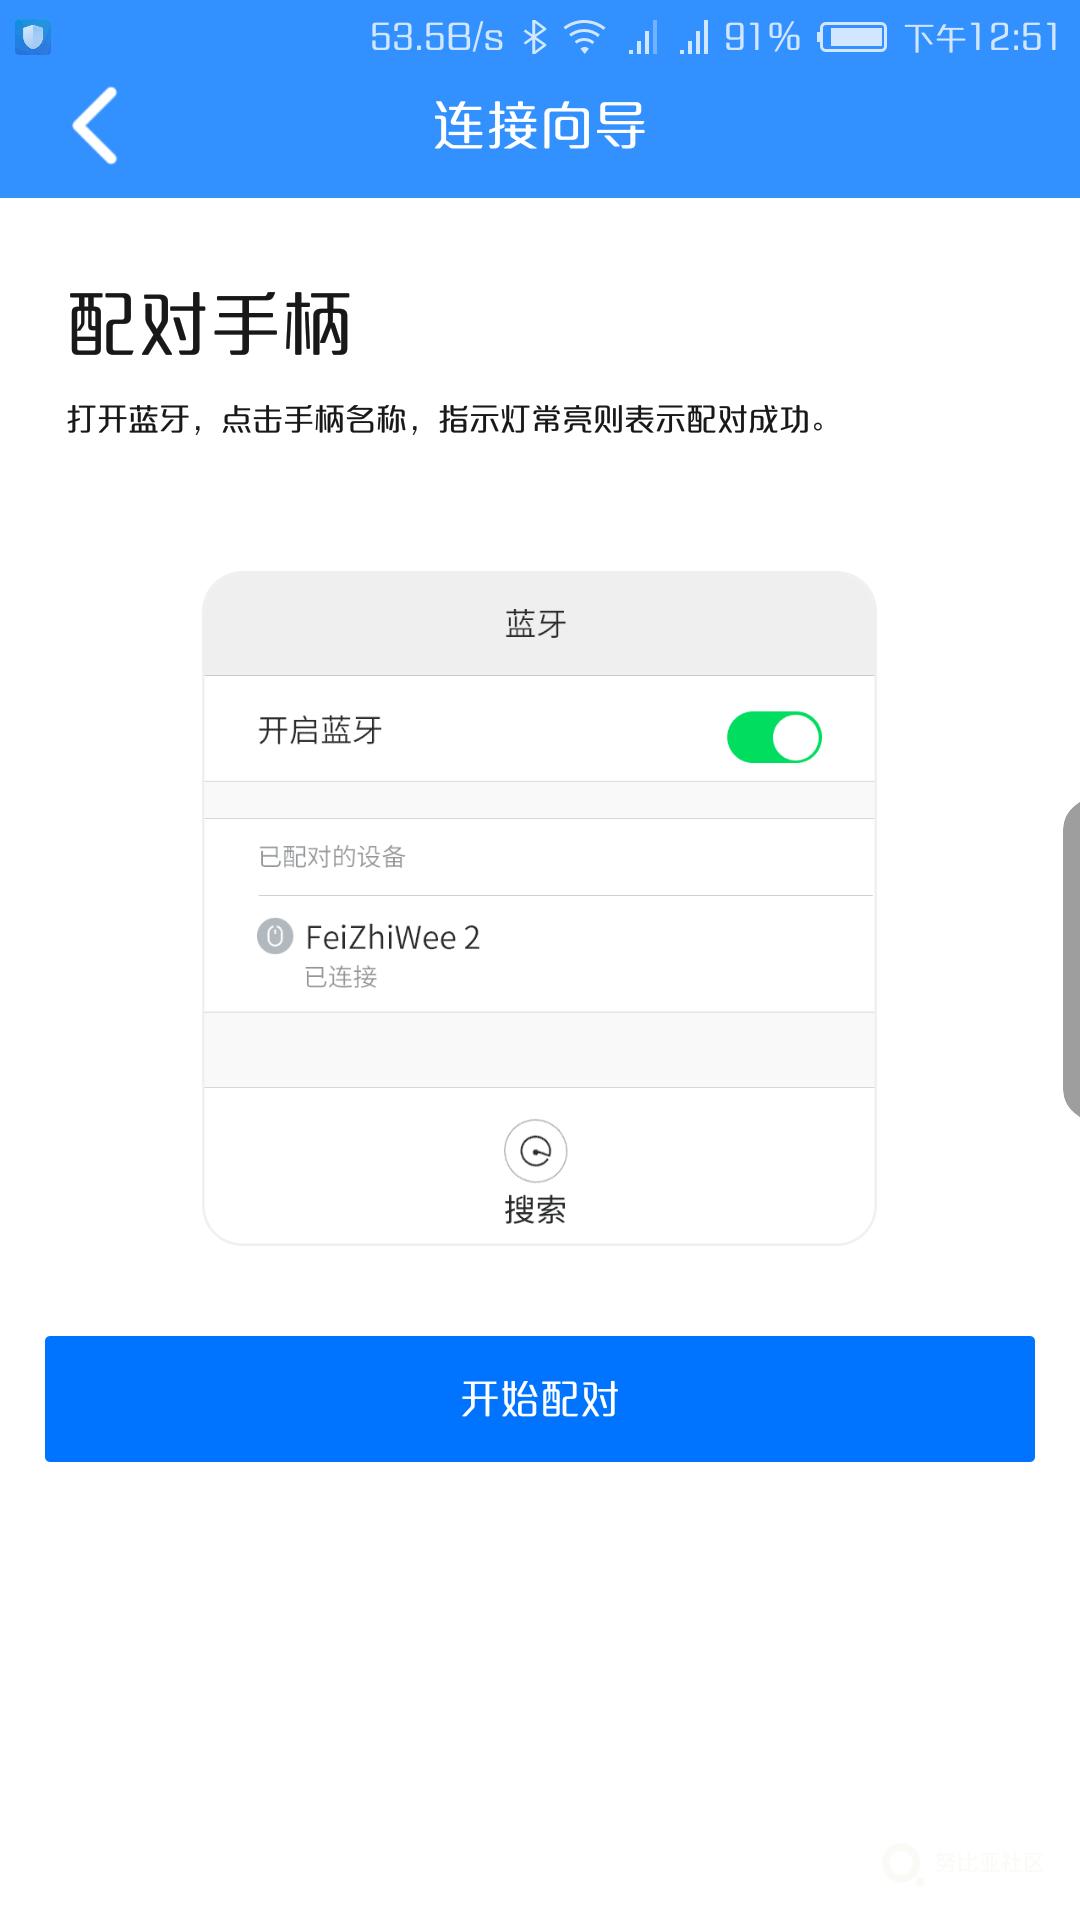 Screenshot_2018-06-09-12-51-31.png